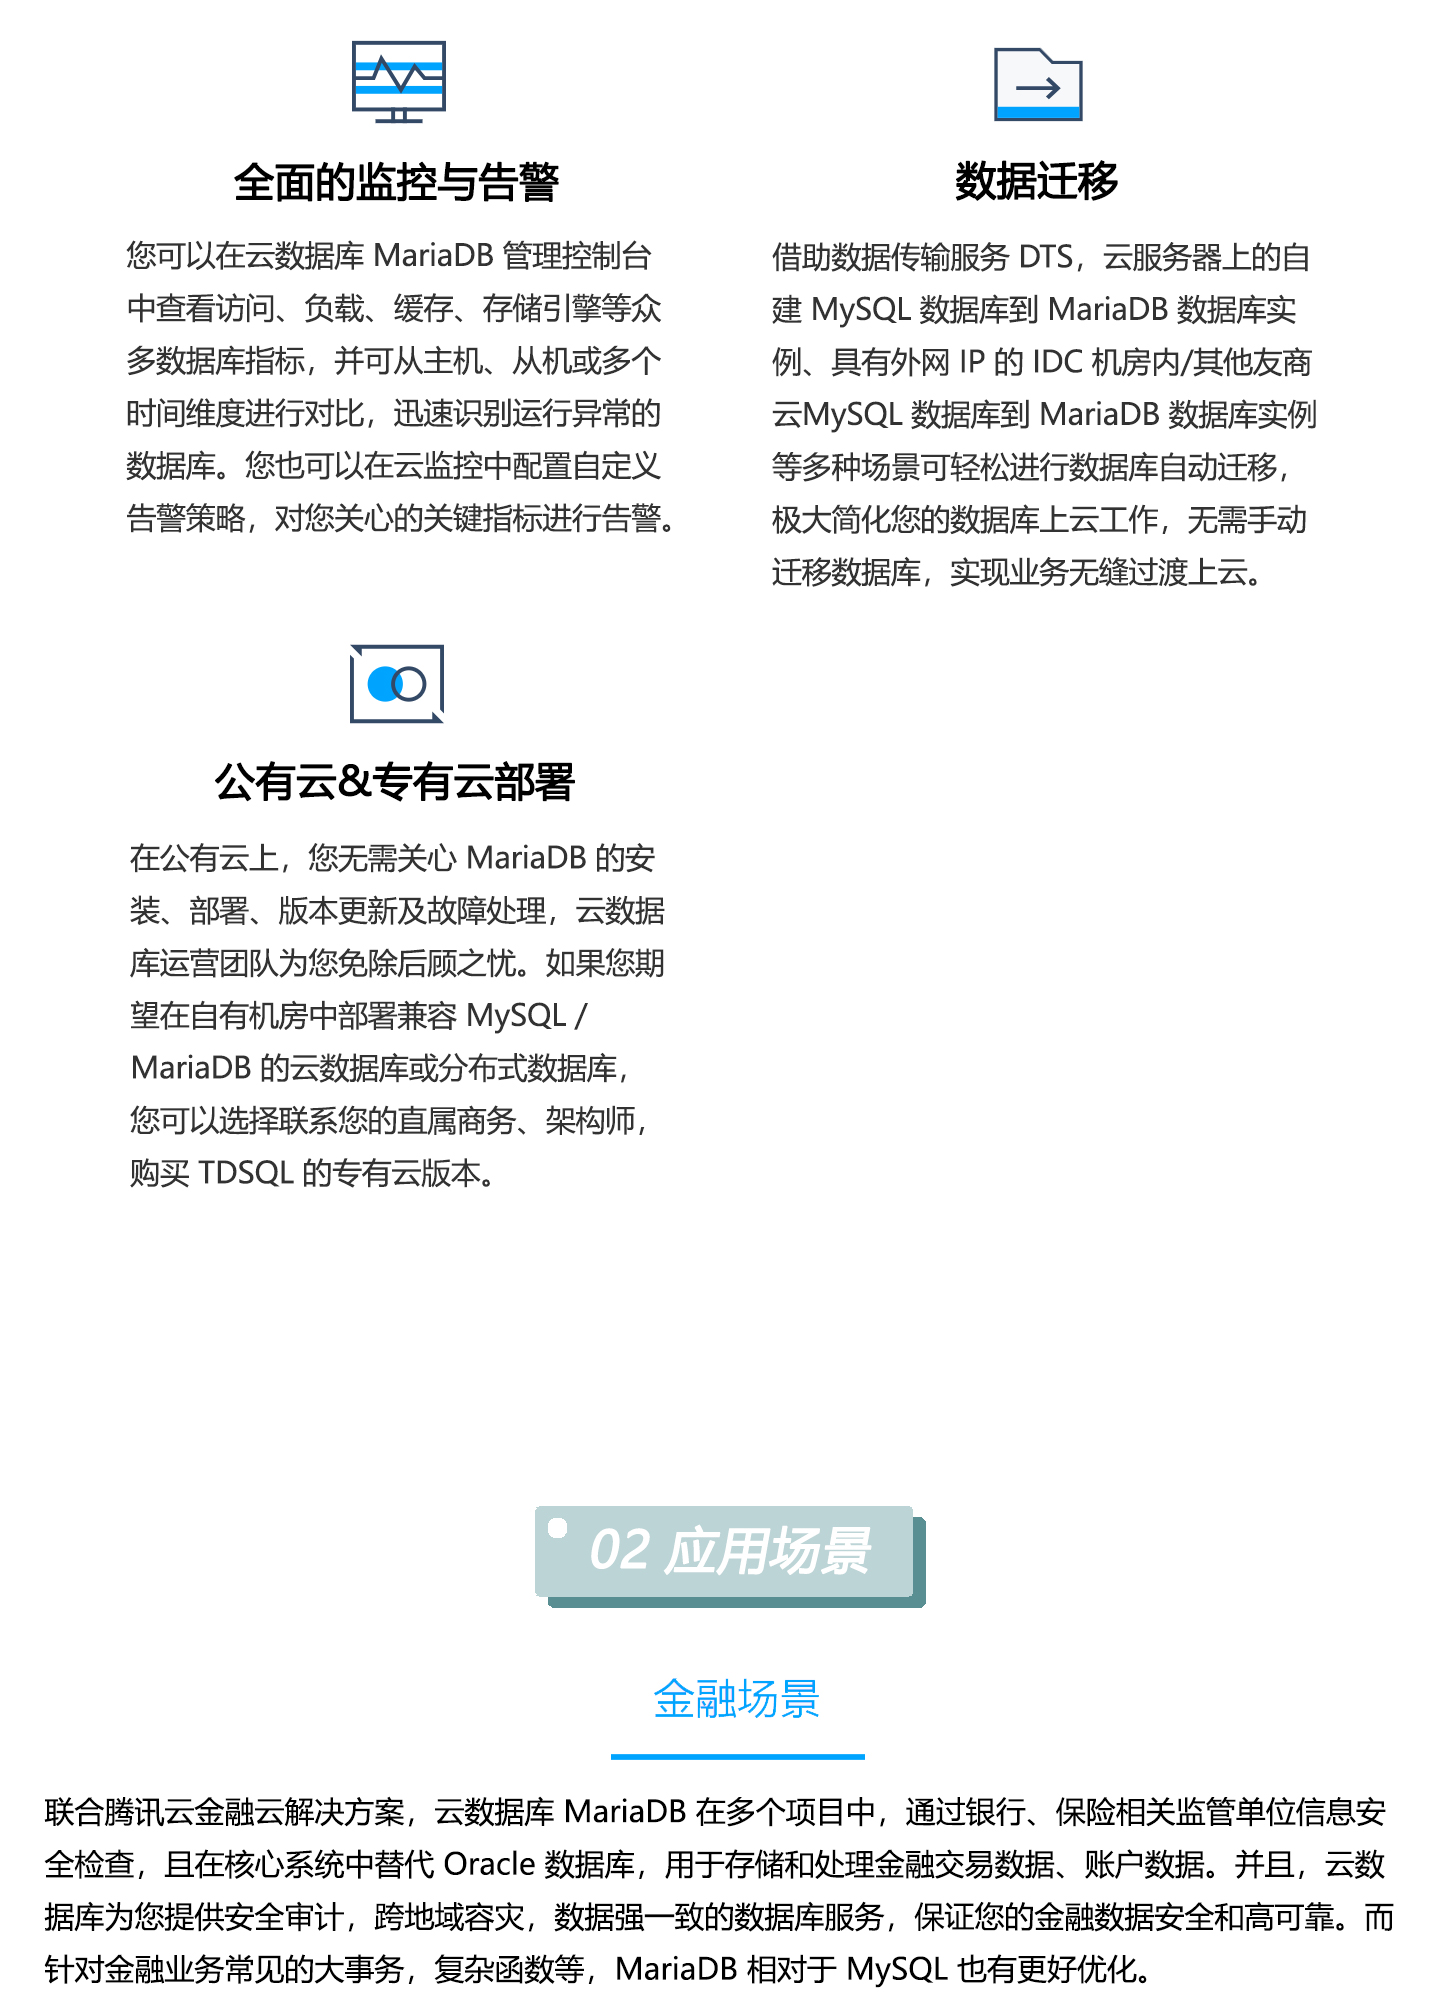 云数据库-TencentDB-for-MariaDB-1440_03.jpg